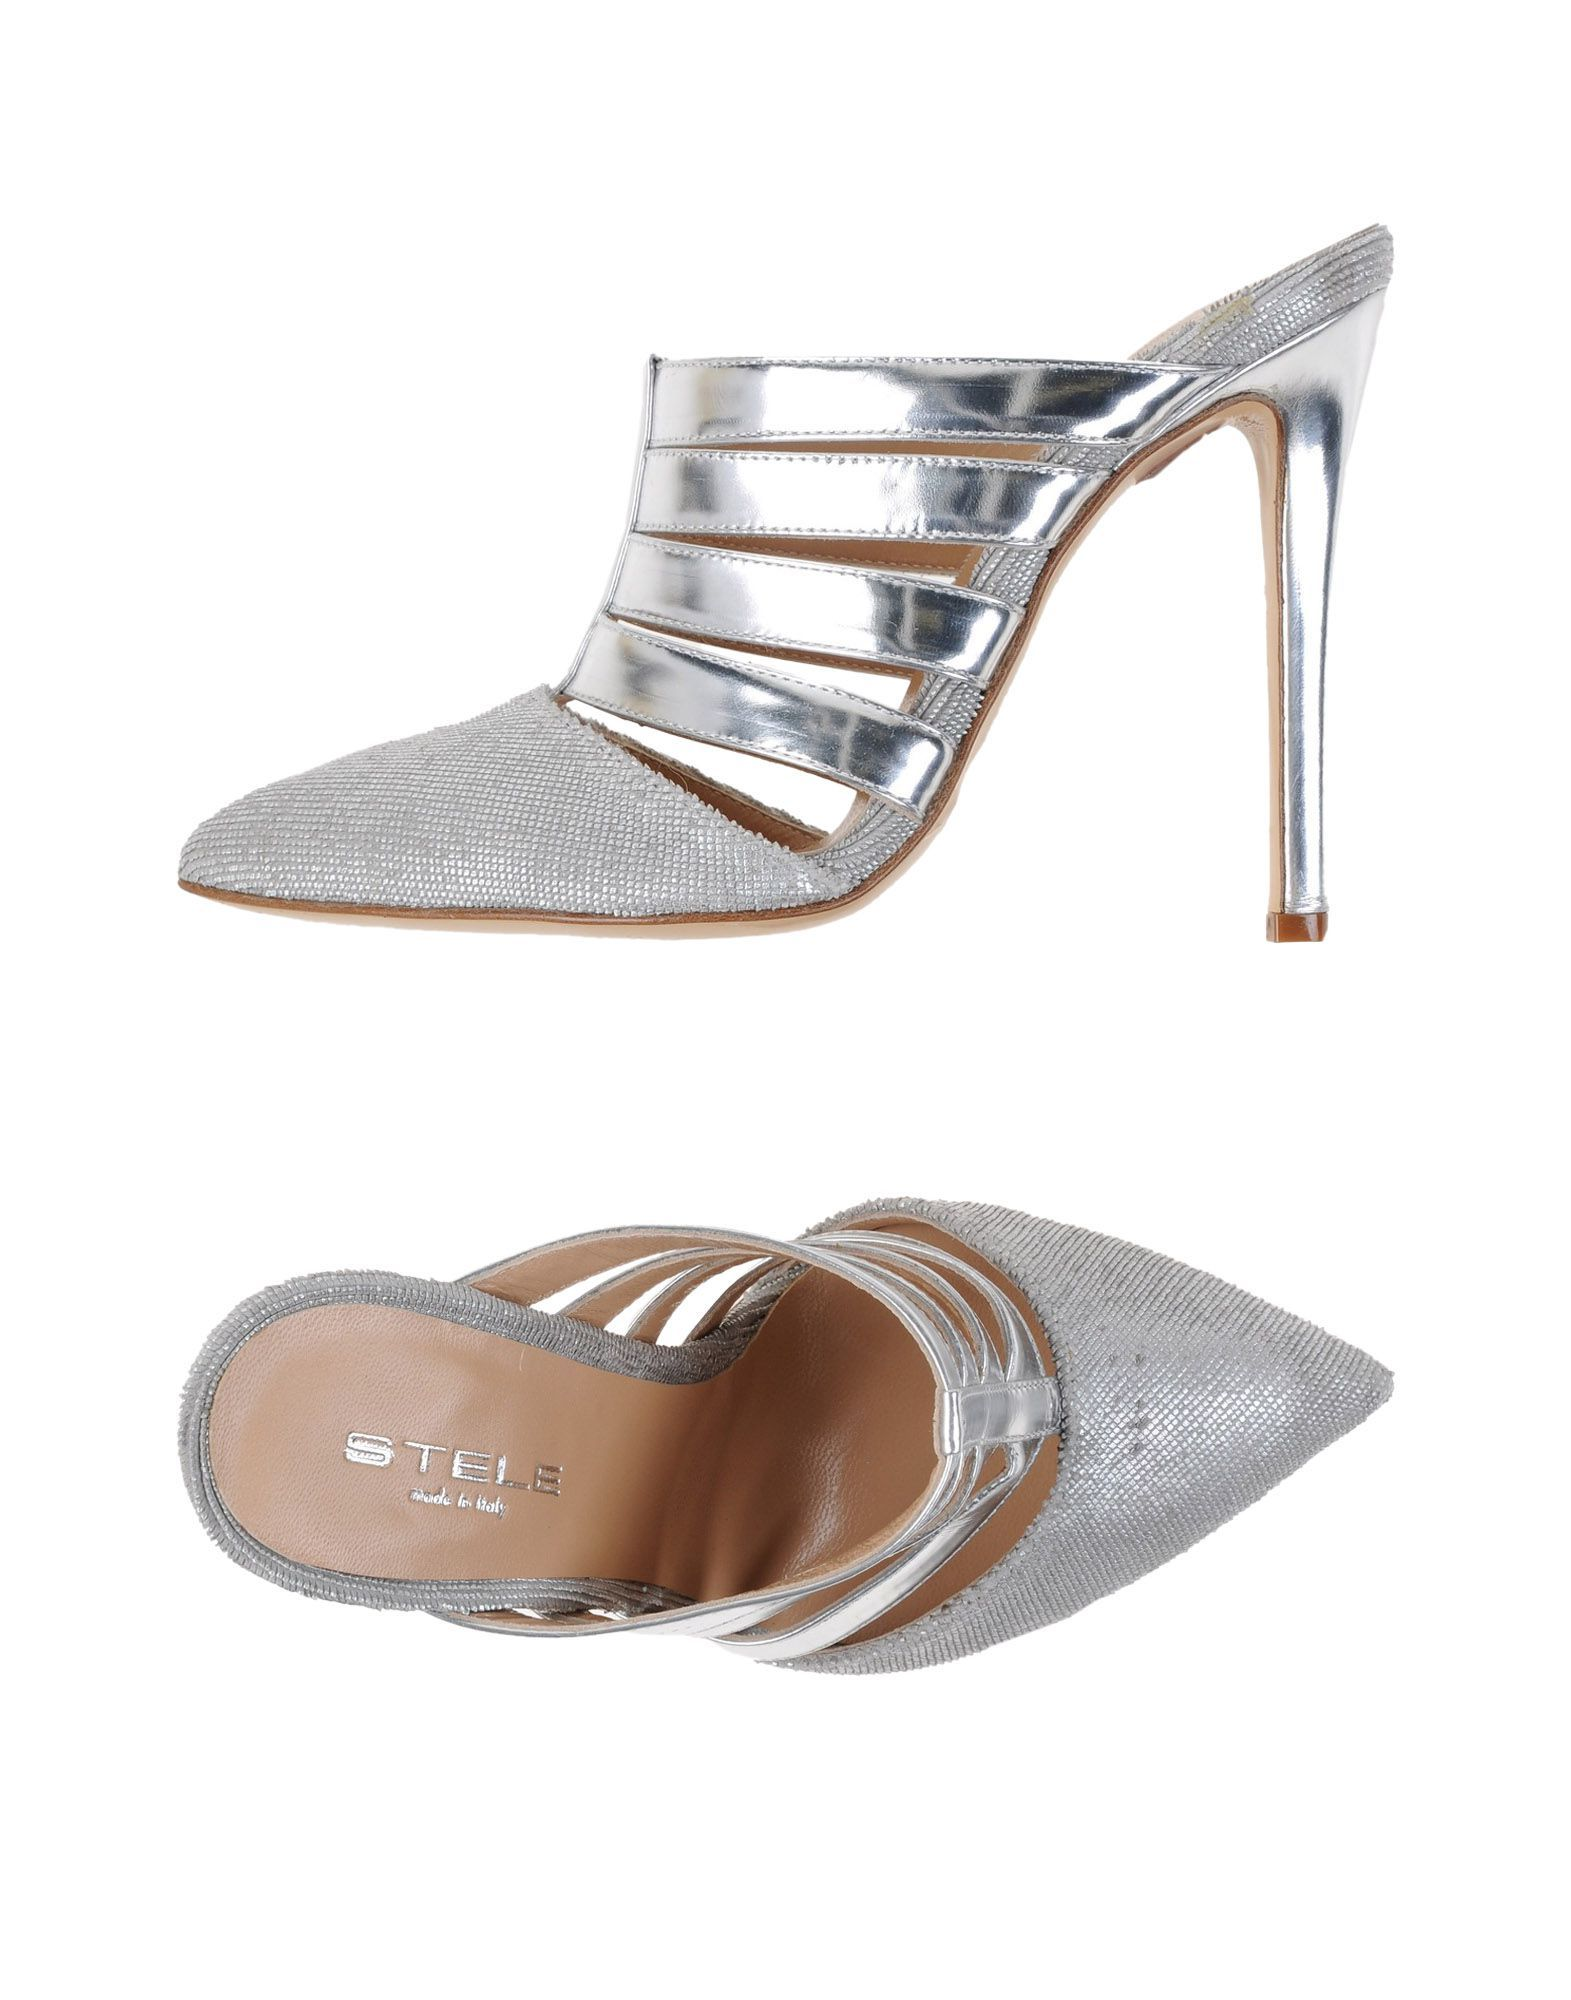 FOOTWEAR - Mules on YOOX.COM Stele DsBP0o